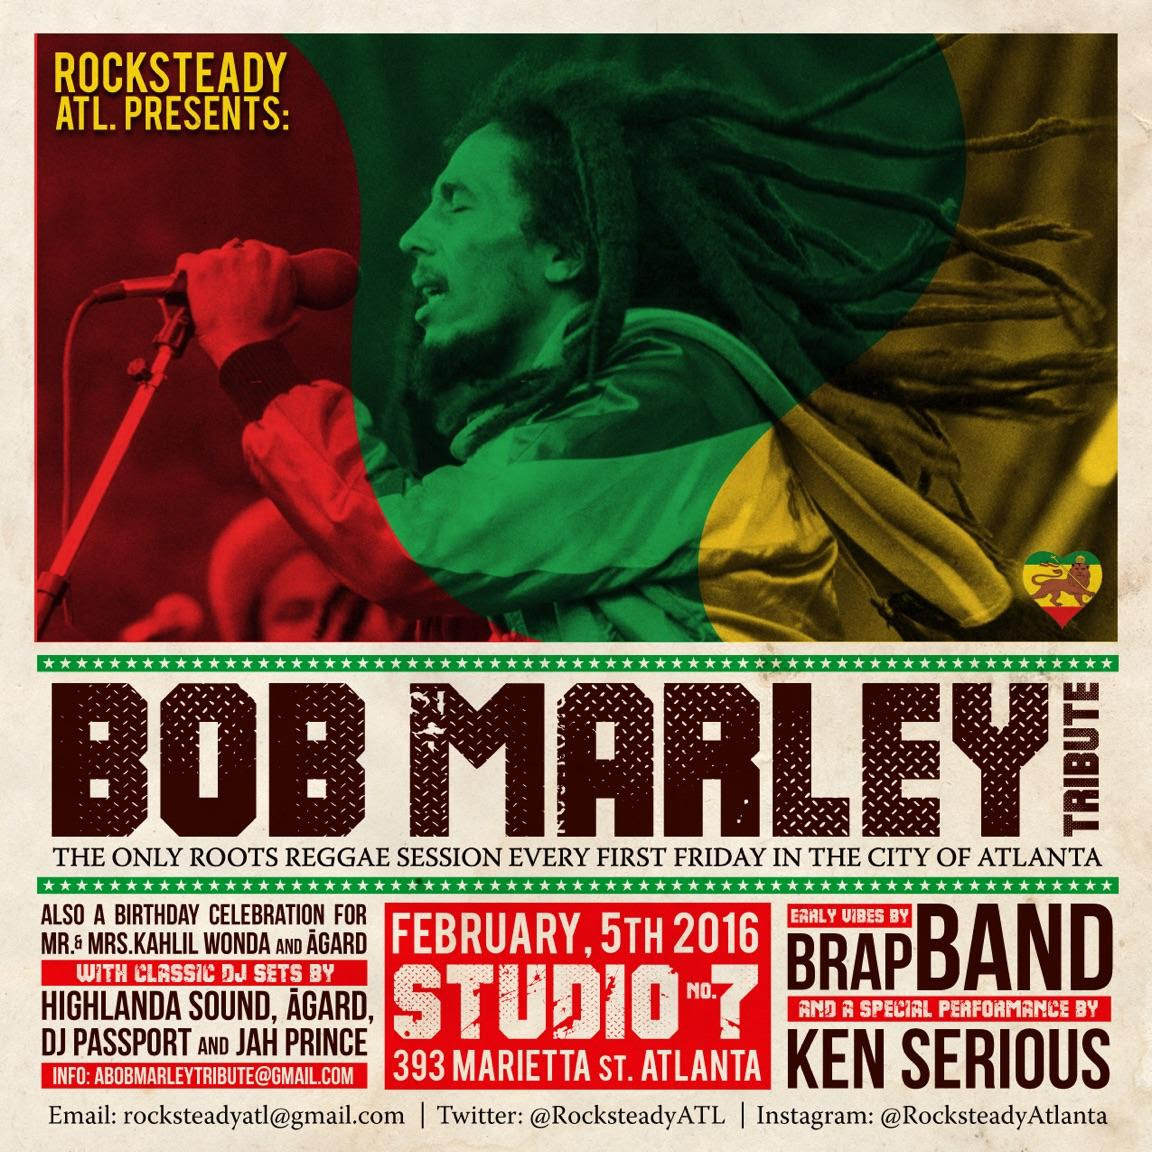 FRI, FEB 5, 2016 AT 9:00 PM BOB MARLEY 71ST BIRTHDAY BASH AND AQUARIUS CELEBRATION Studio No. 7, Atlanta, GA